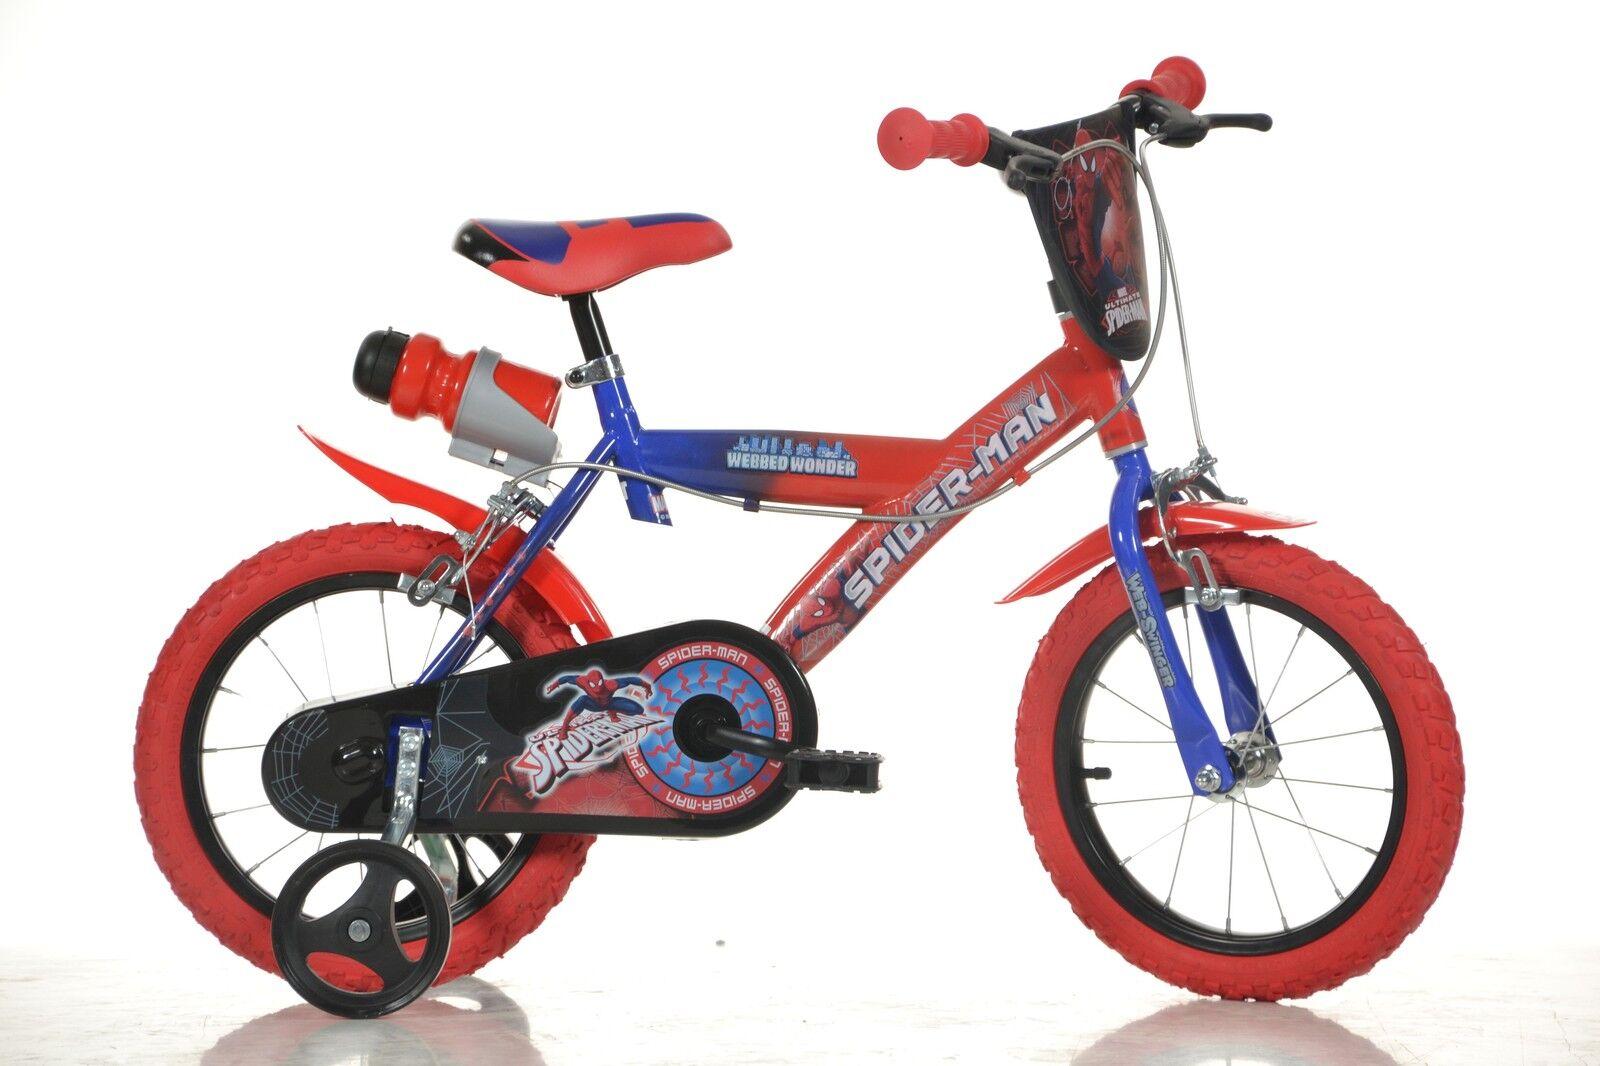 14 Zoll Kinderfahrrad Spiderman Original Original Original Lizenz Kinderrad Fahrrad Spielrad 8b1095